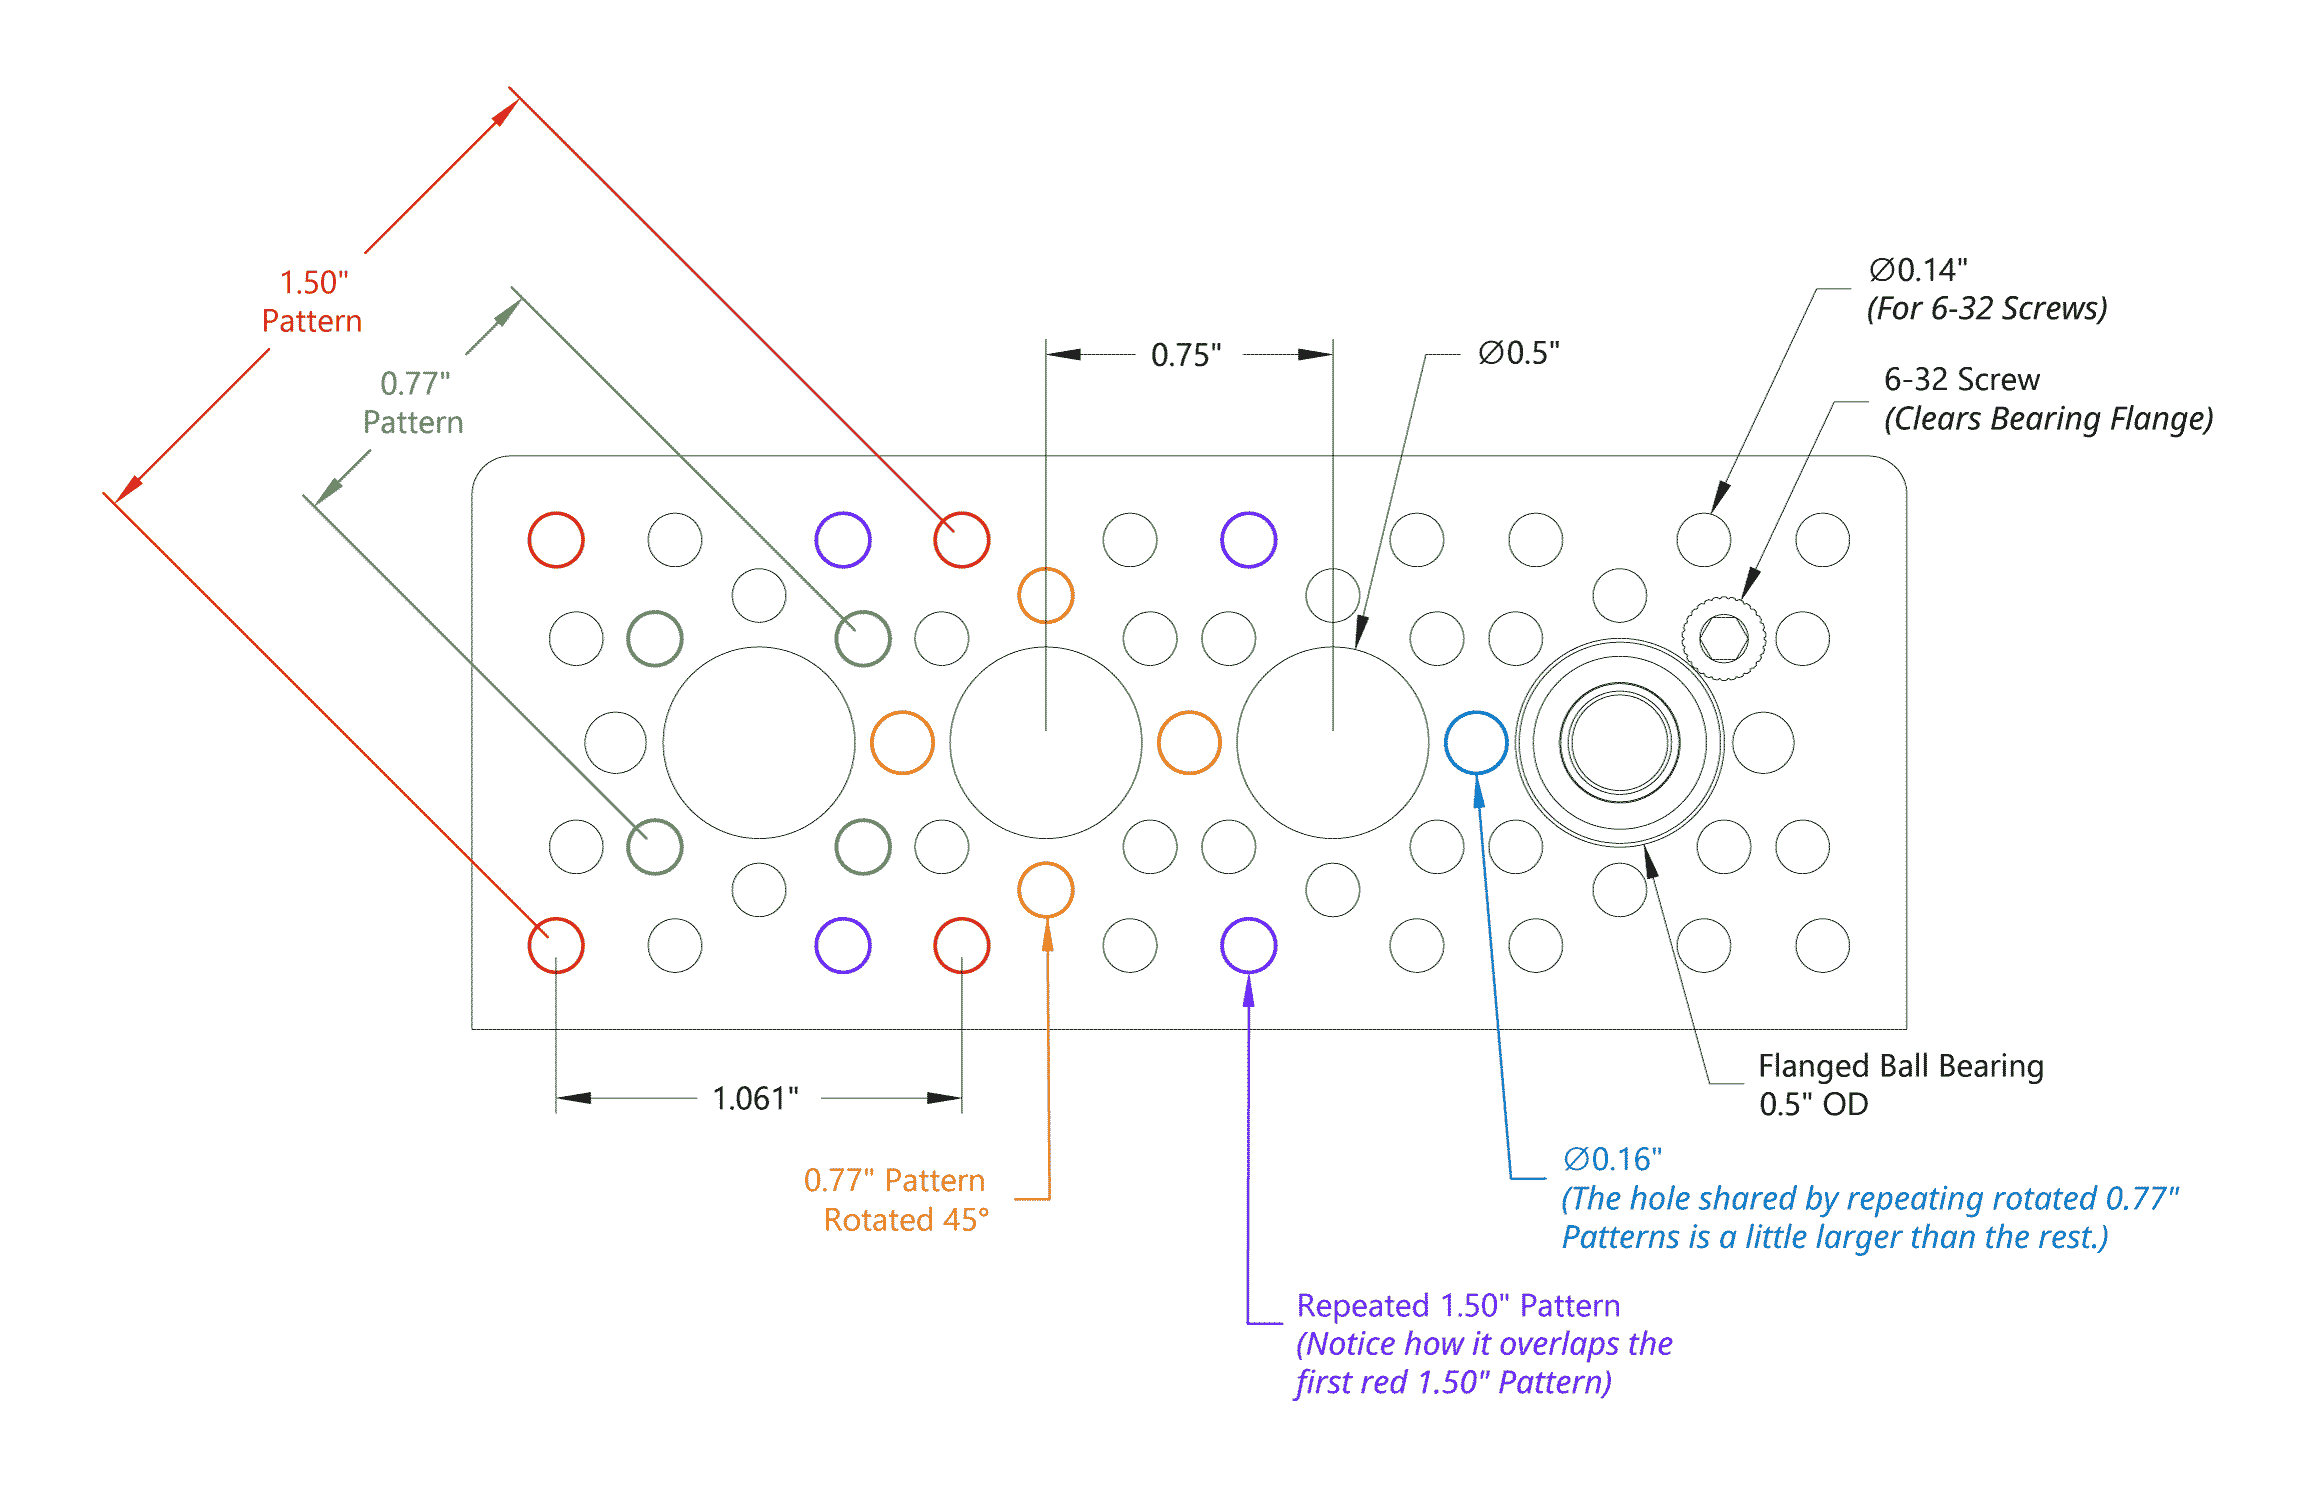 Actobotics Hole Pattern Information